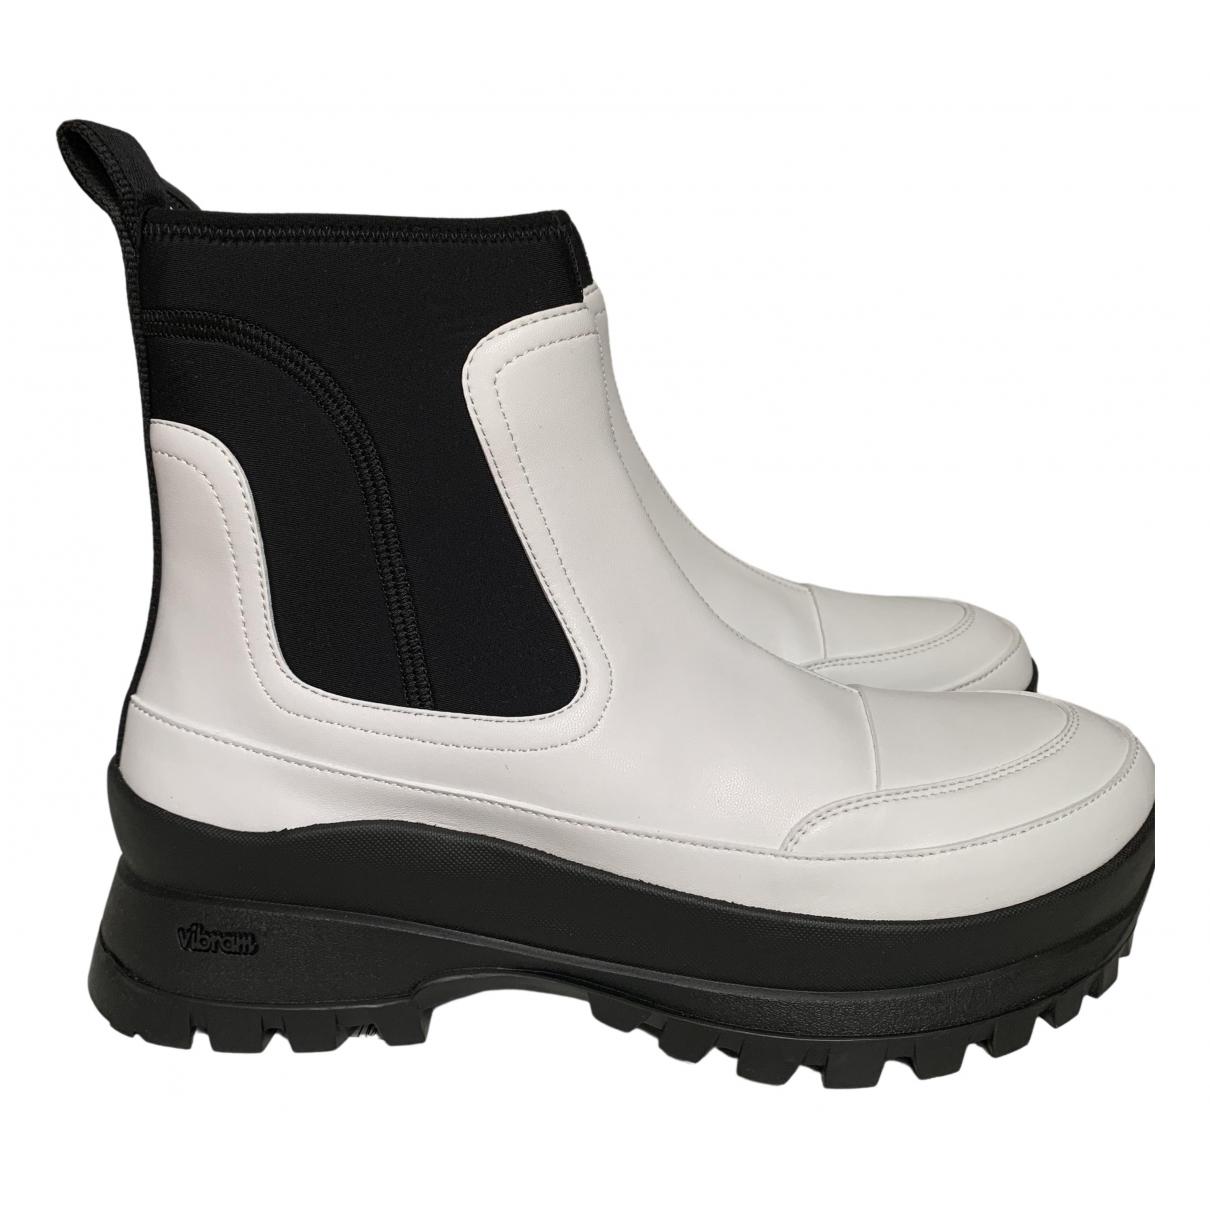 Stella Mccartney N White Ankle boots for Women 38 EU